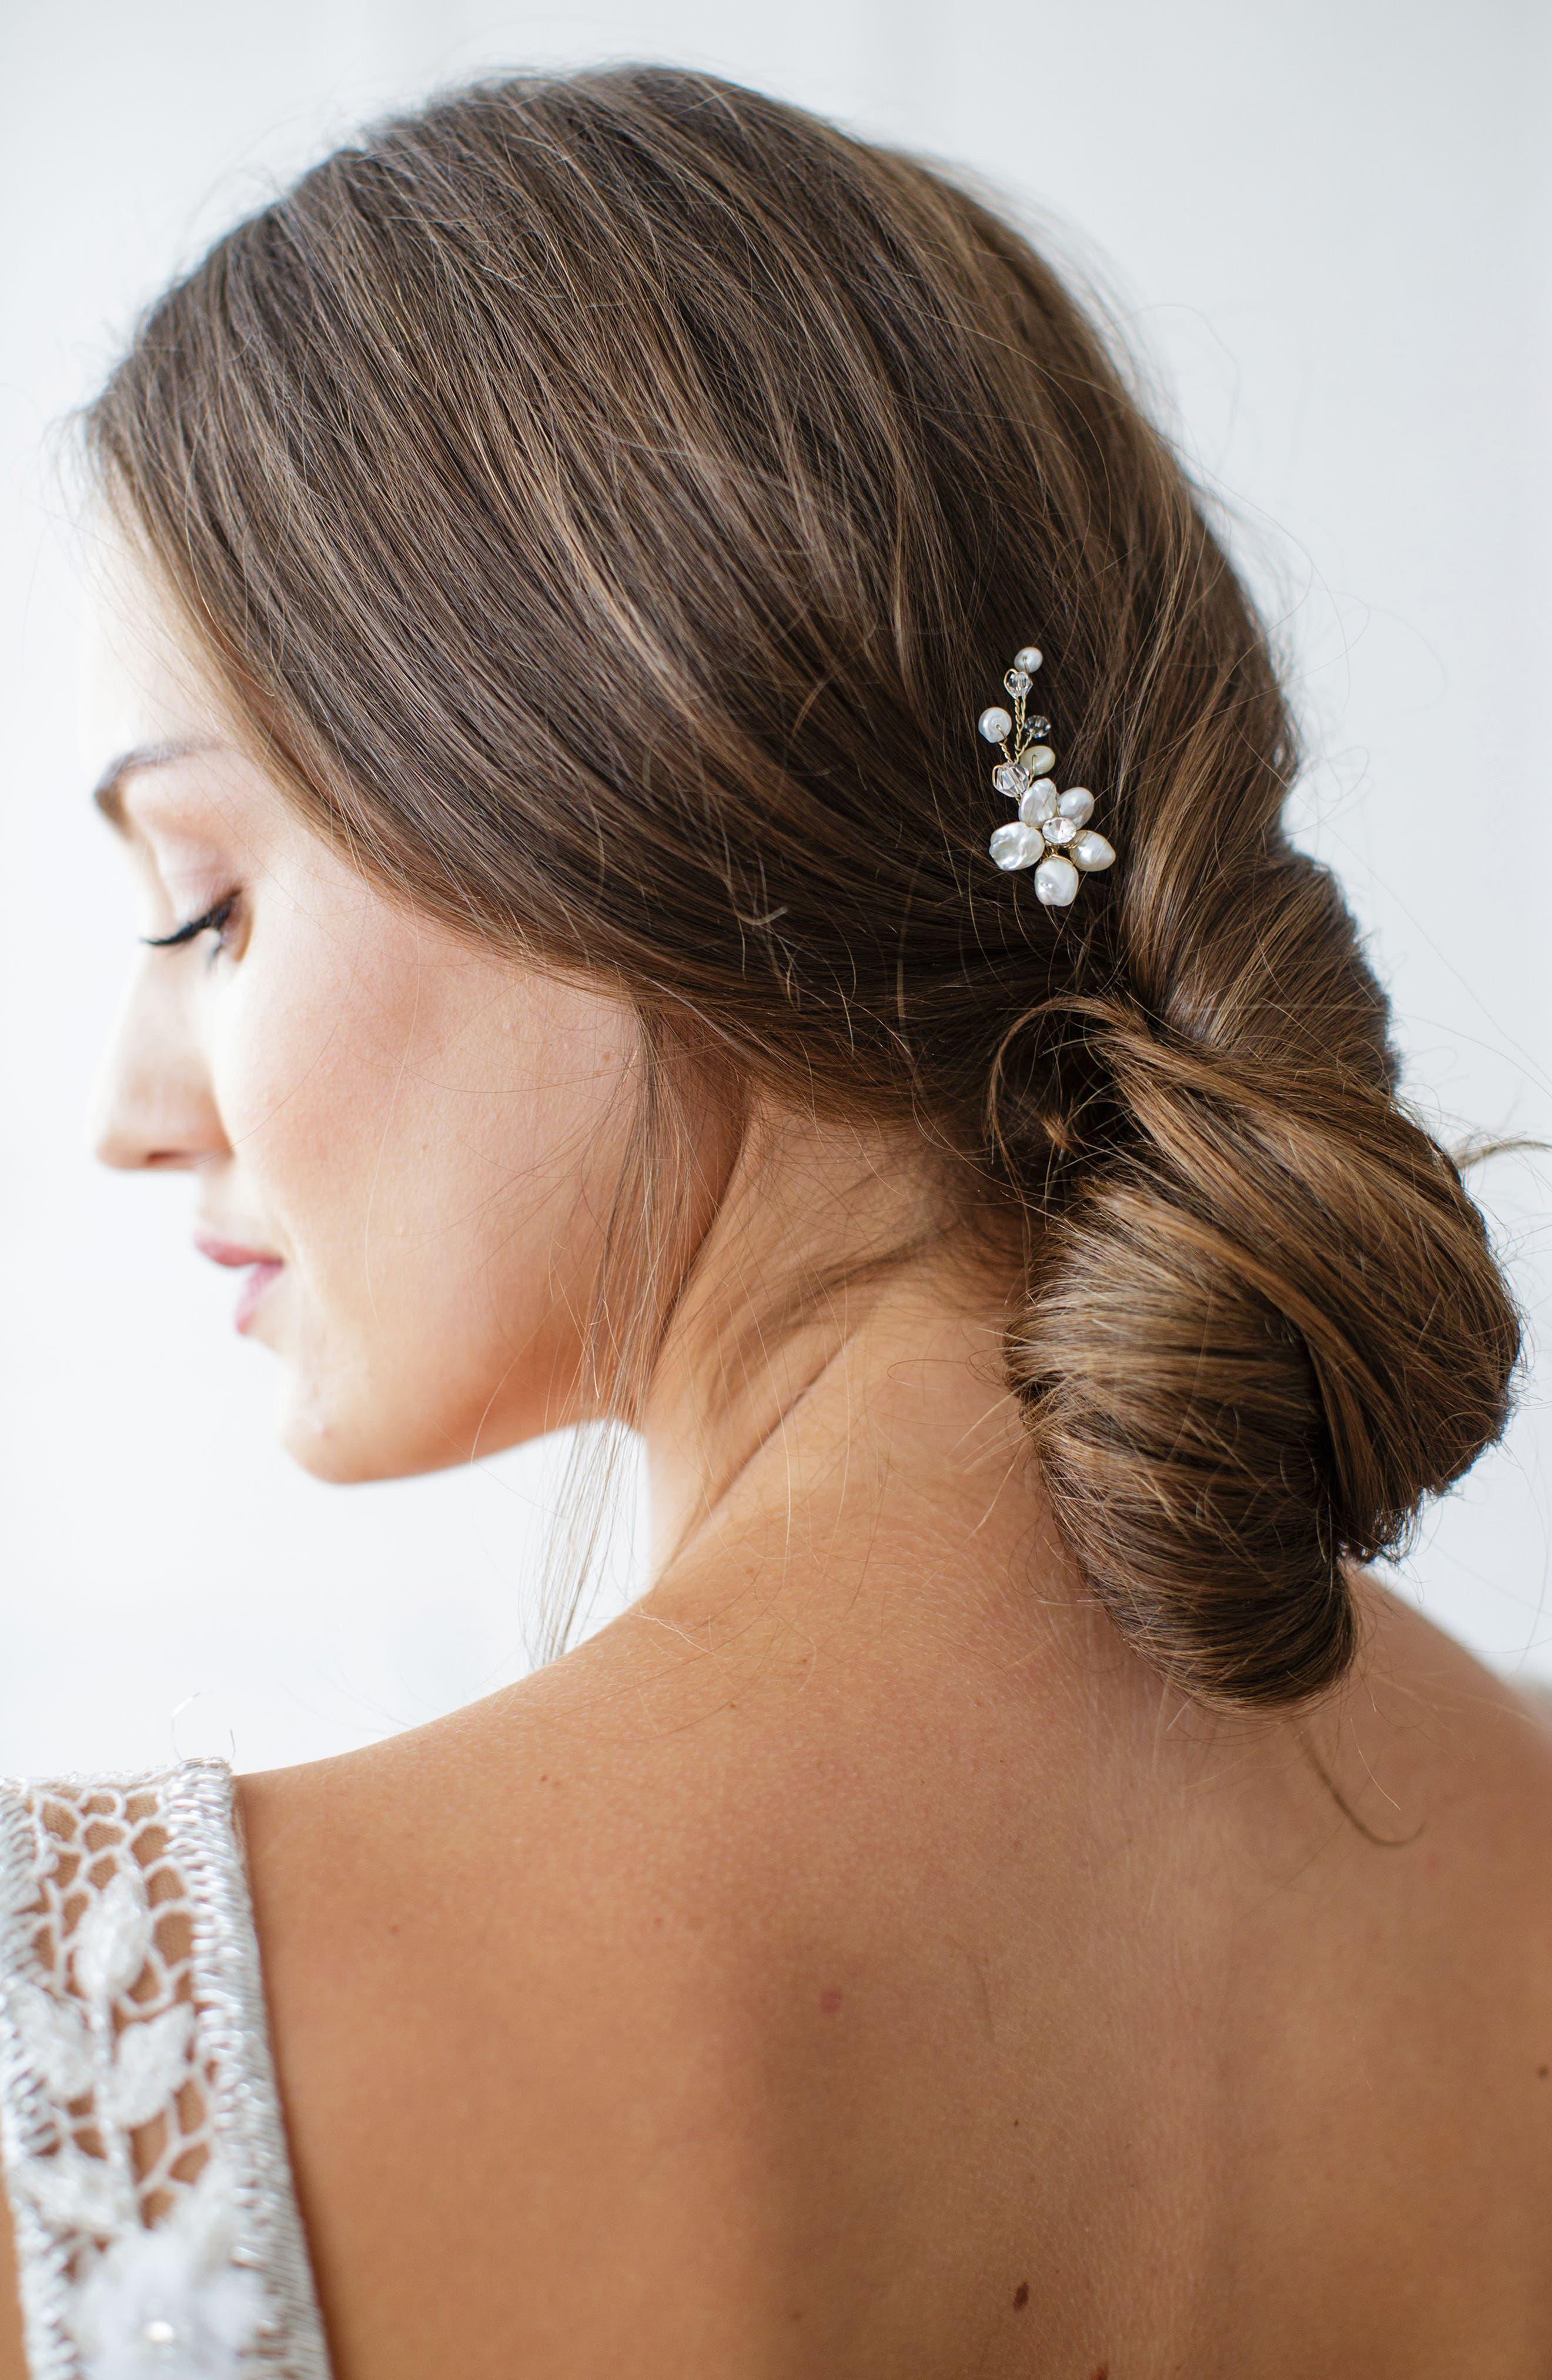 Alternate Image 1 Selected - Brides & Hairpins Nahla Pearl & Crystal Flower Pin